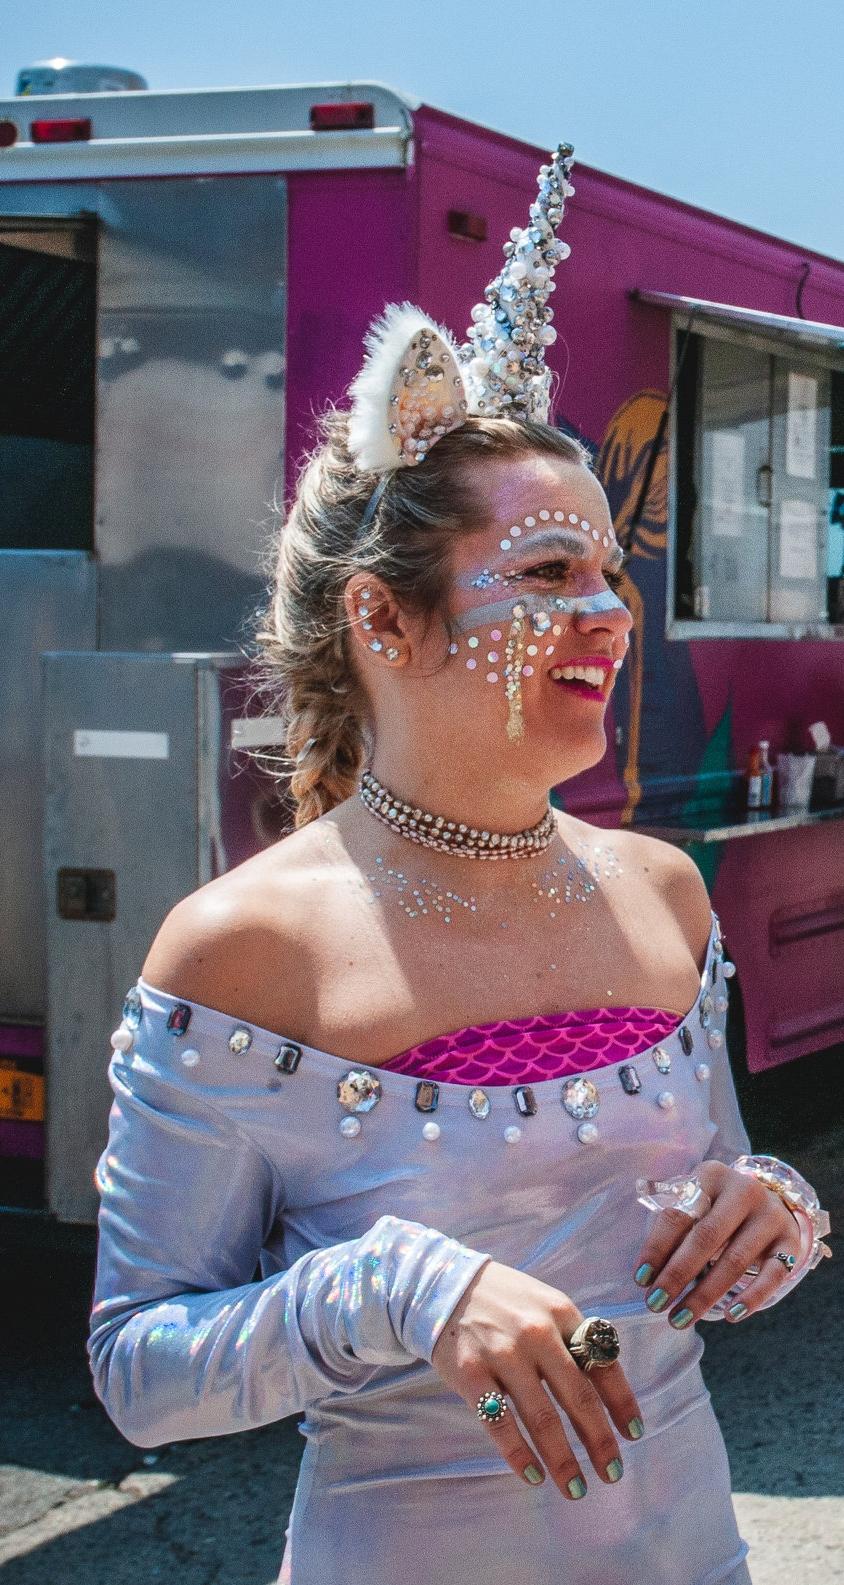 Congrats to costume contest winner  Kalin Hart , who won Riiisa Boogie's mural from the Art Battle!